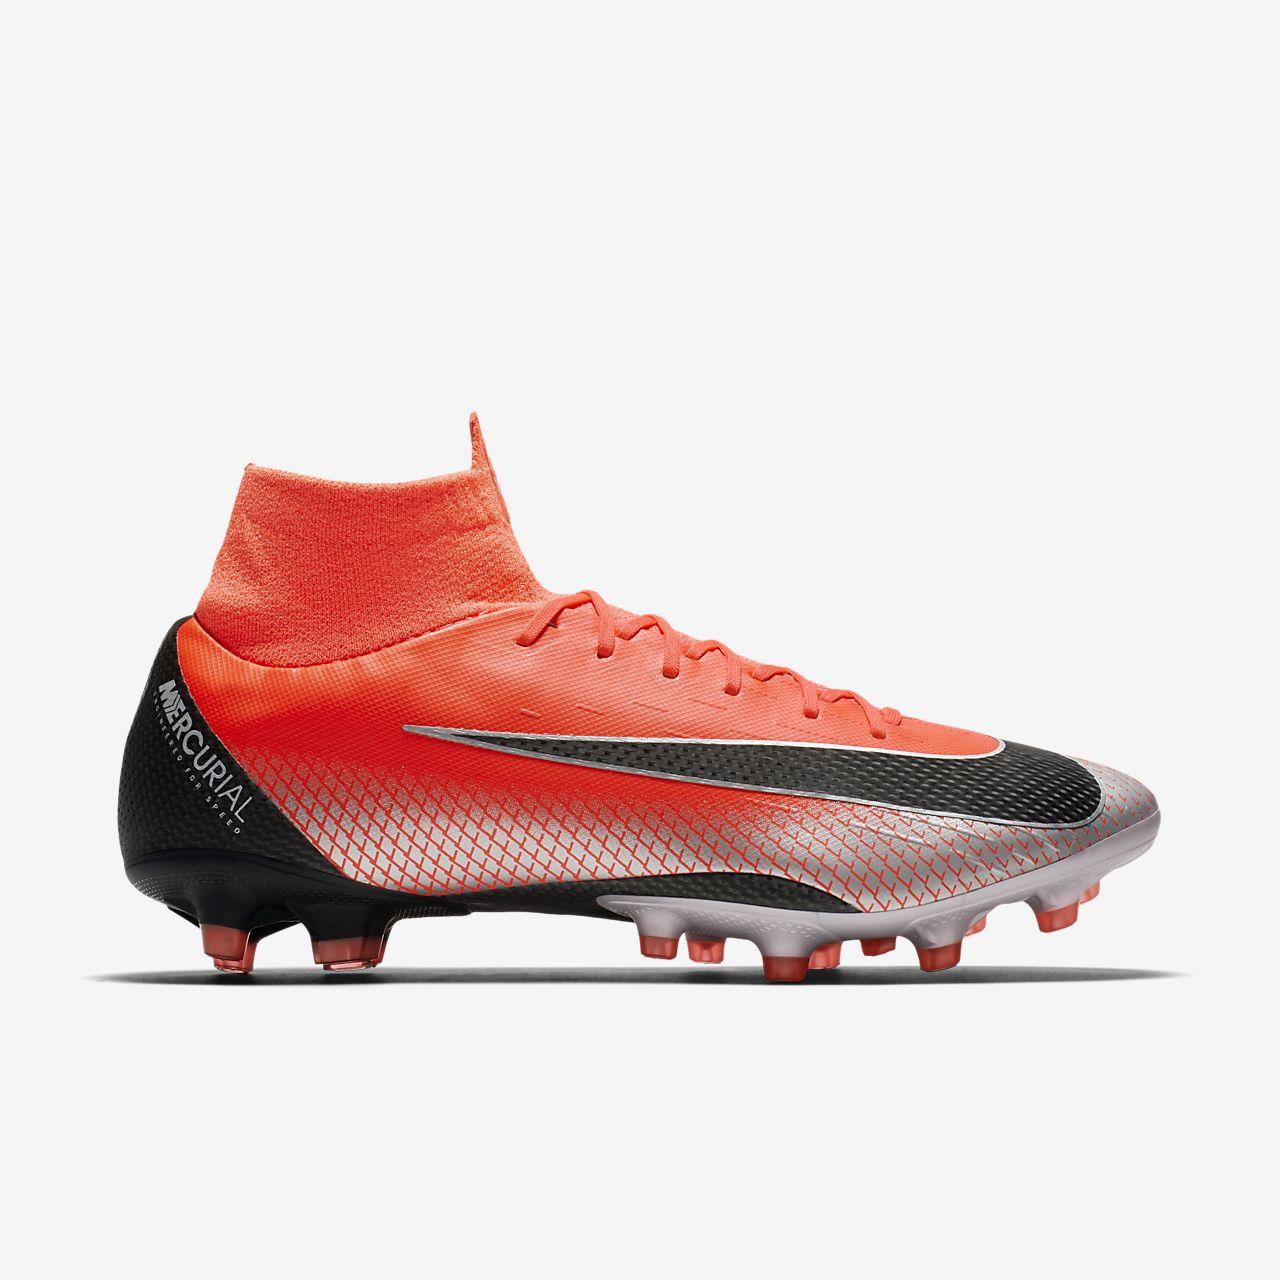 the latest 0c545 e4a8d Calzado de fútbol para pasto artificial Nike Mercurial Superfly VI .